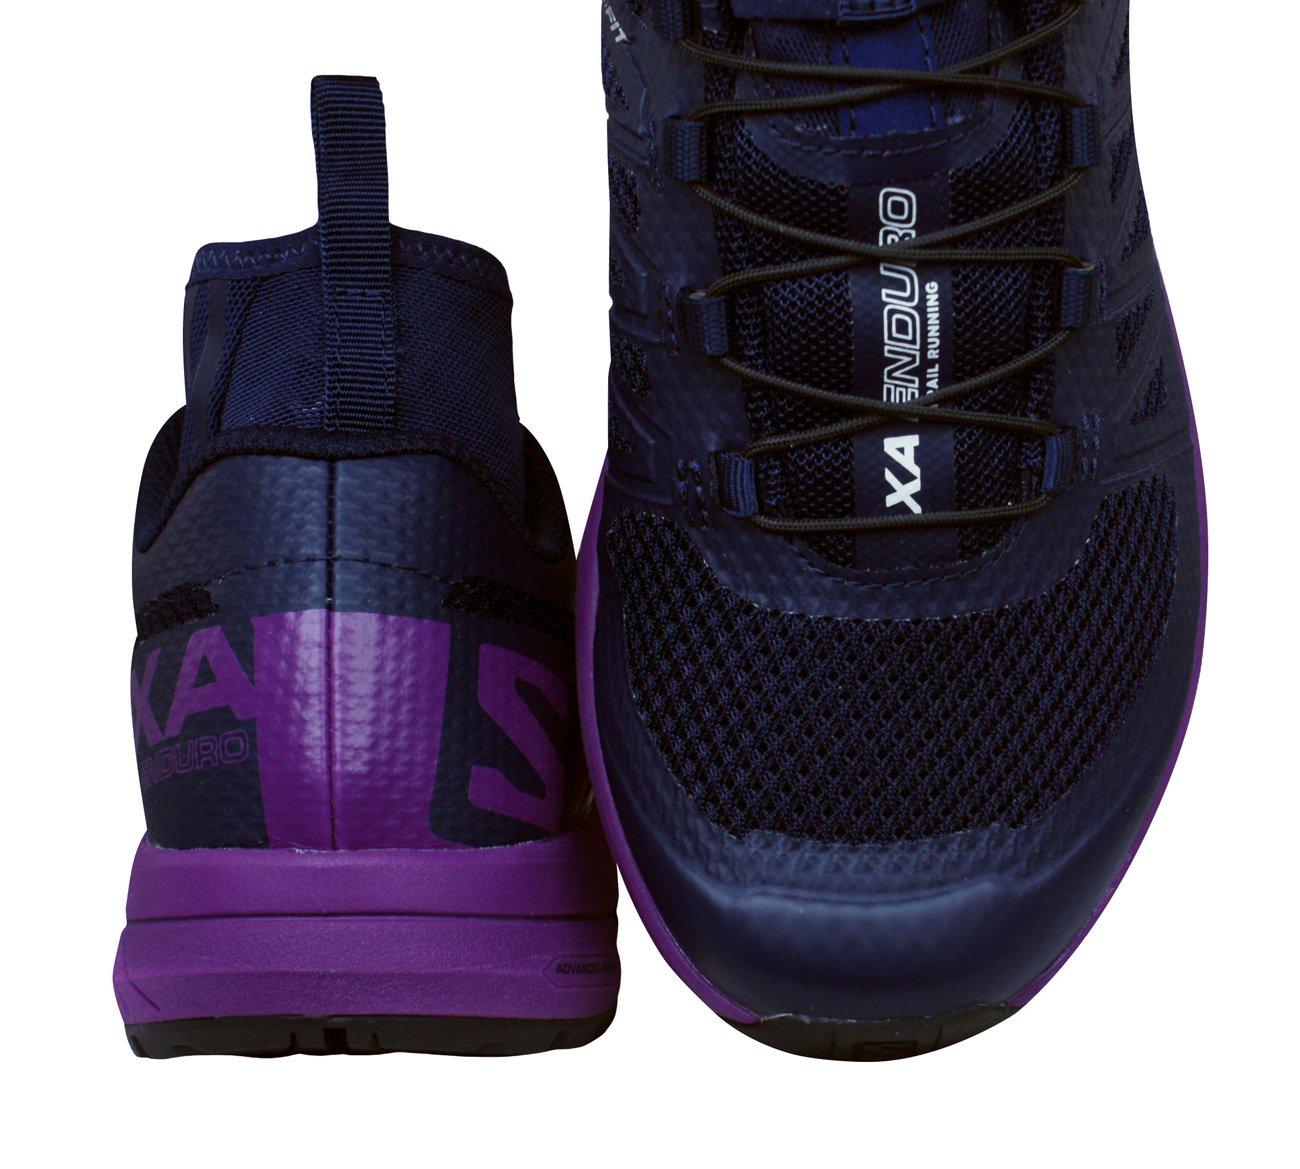 Salomon Women's XA Enduro W Trail Runner, Evening Blue/Grape Juice/Black, 9.5 M US by Salomon (Image #2)